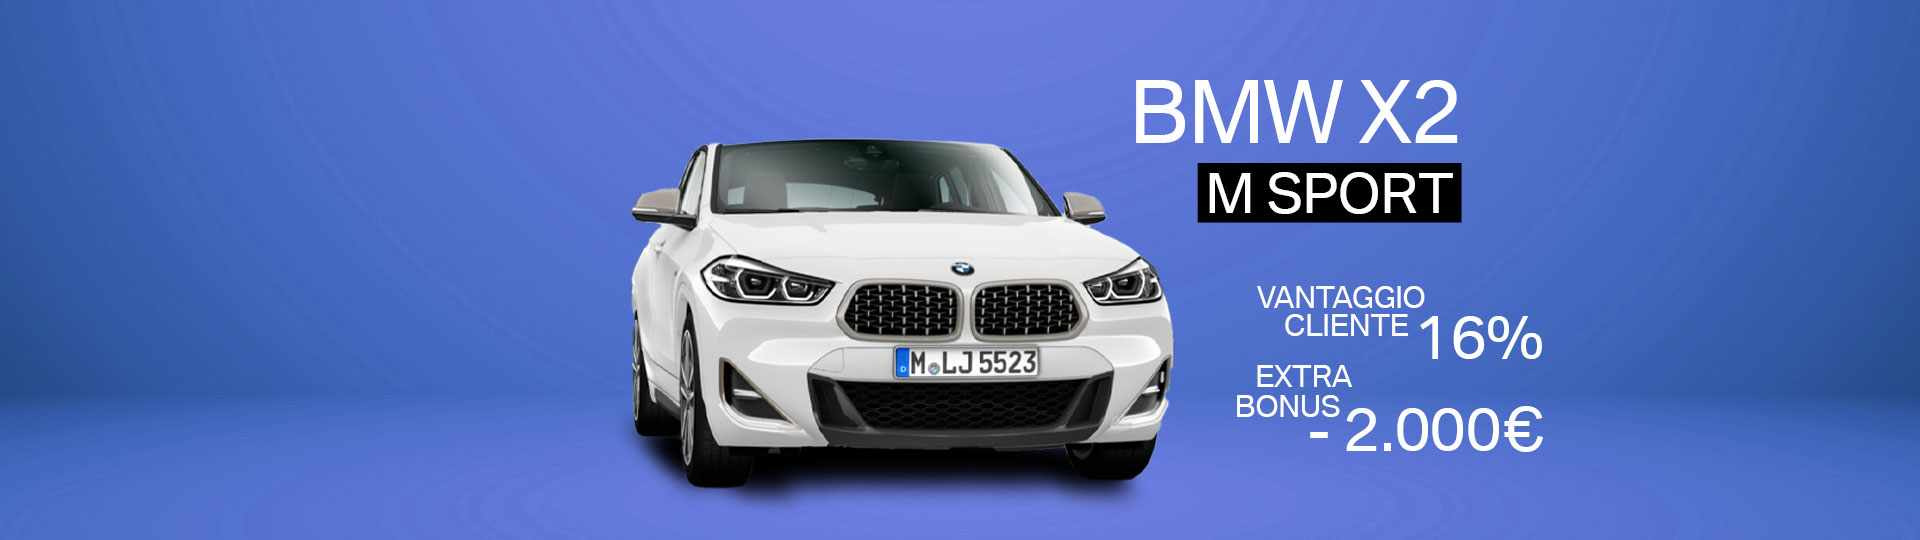 BMW-X2-M_gennaio-2021-min.jpg